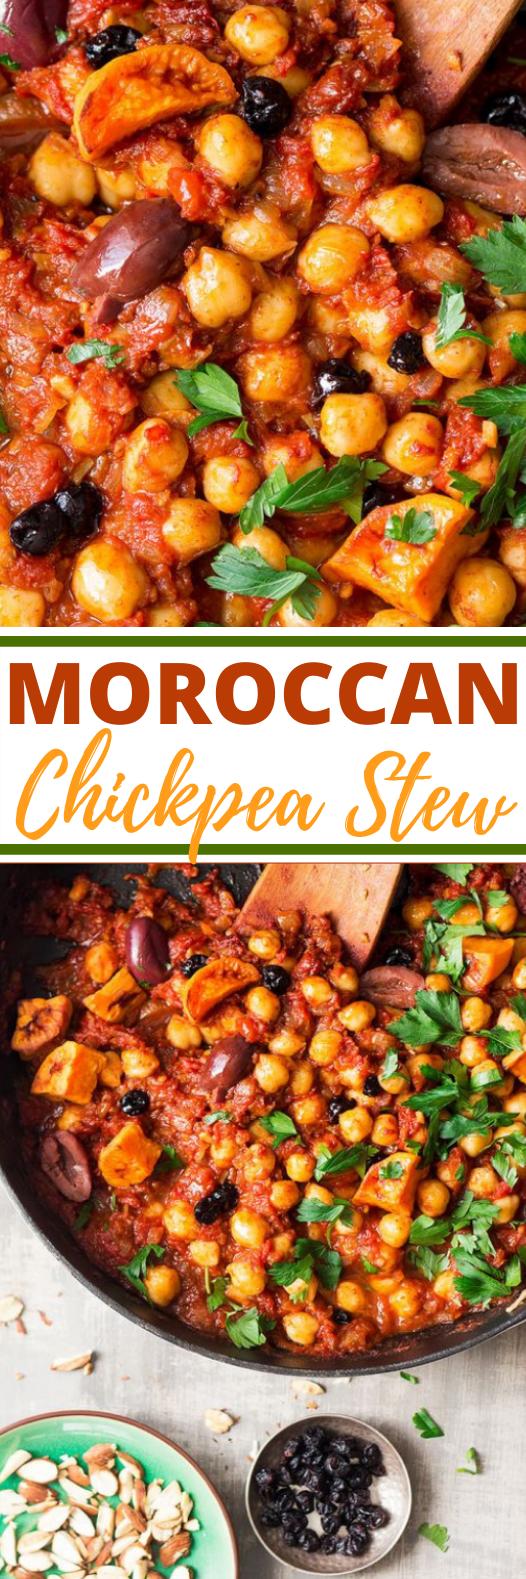 Moroccan chickpea stew #vegetarian #recipes #vegan #dinner #stew